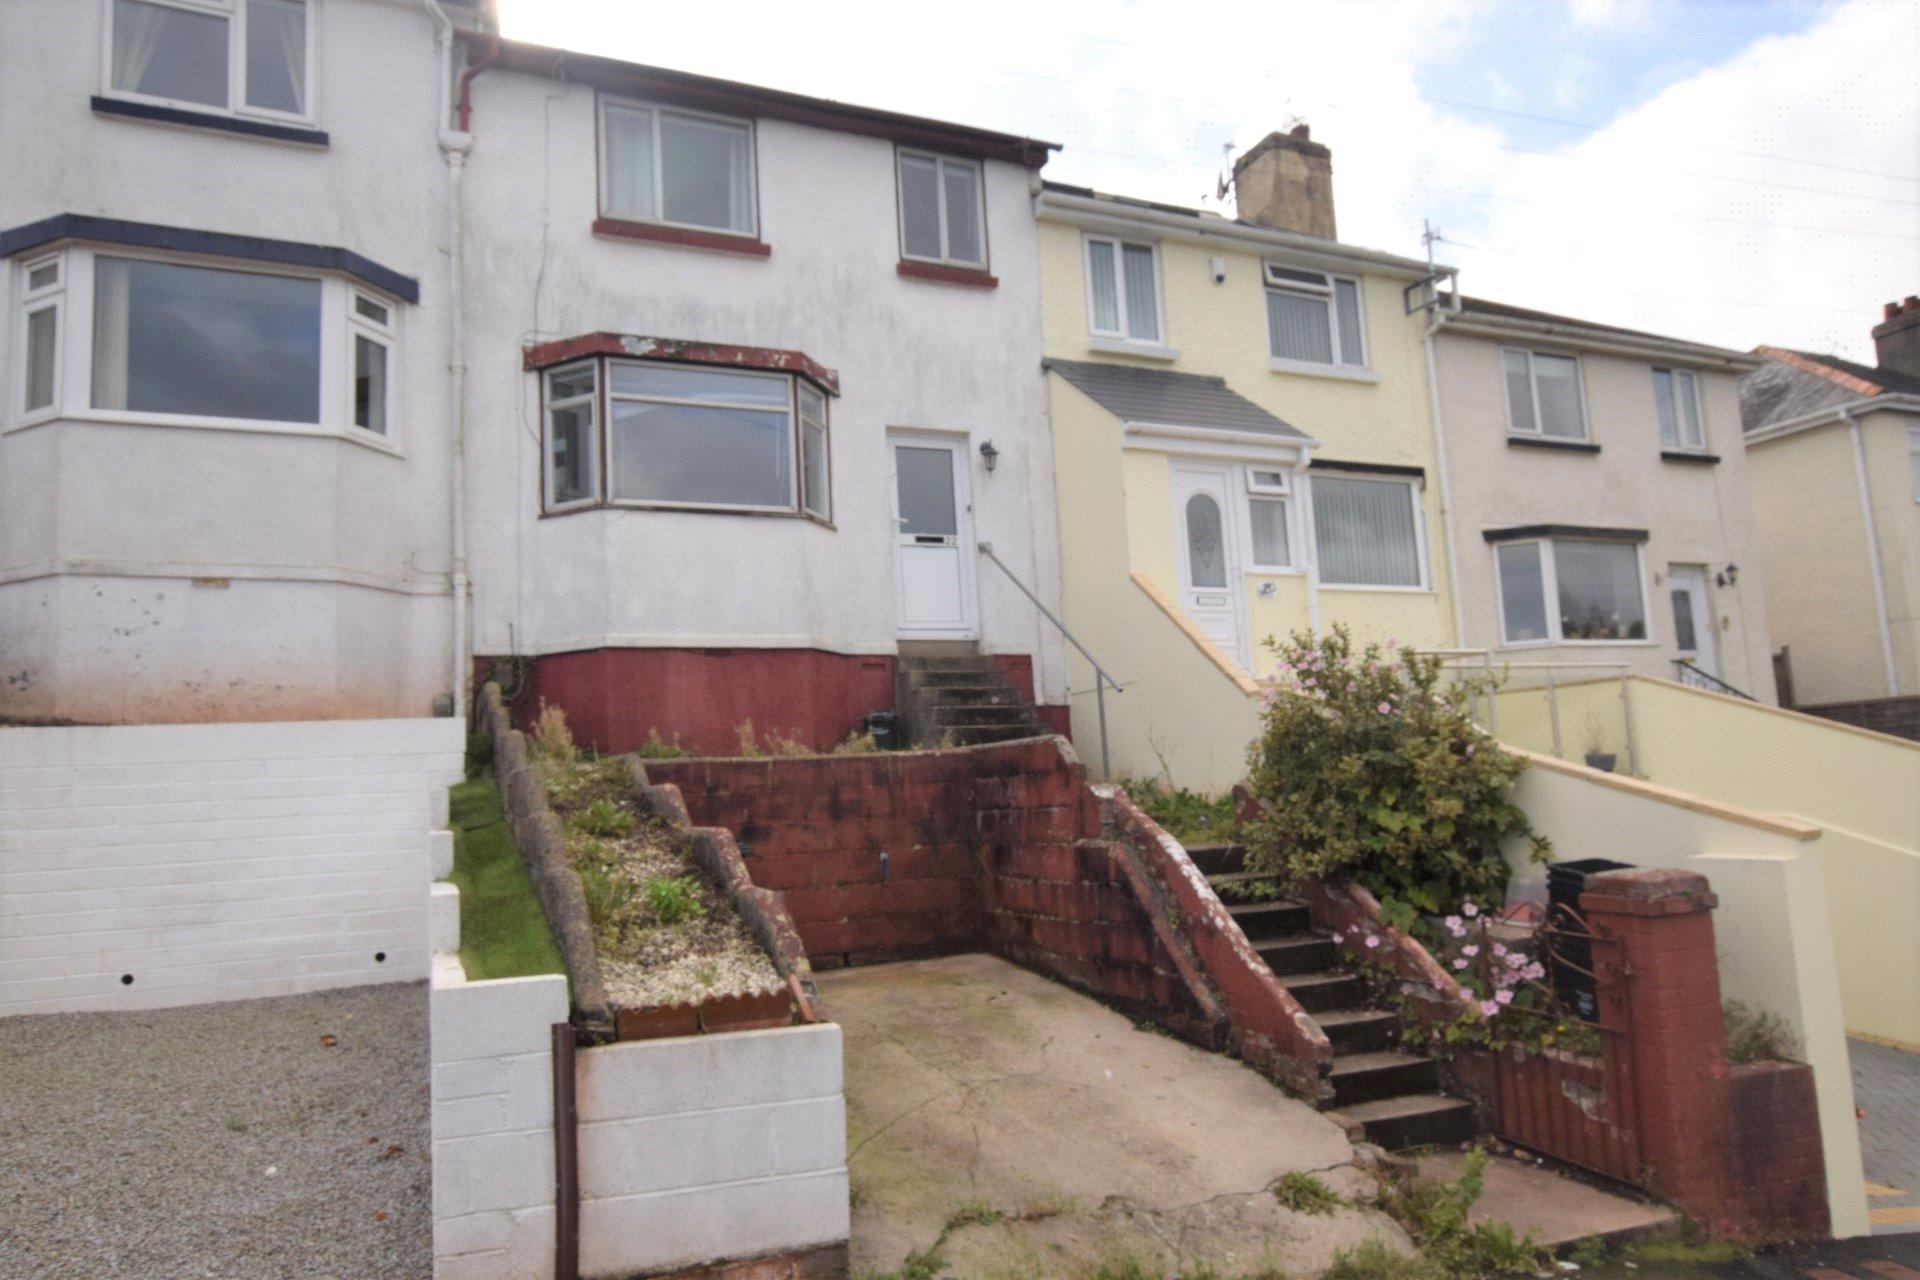 3 Bedroom Property For Sale In Berry Avenue Paignton Devon Tq3